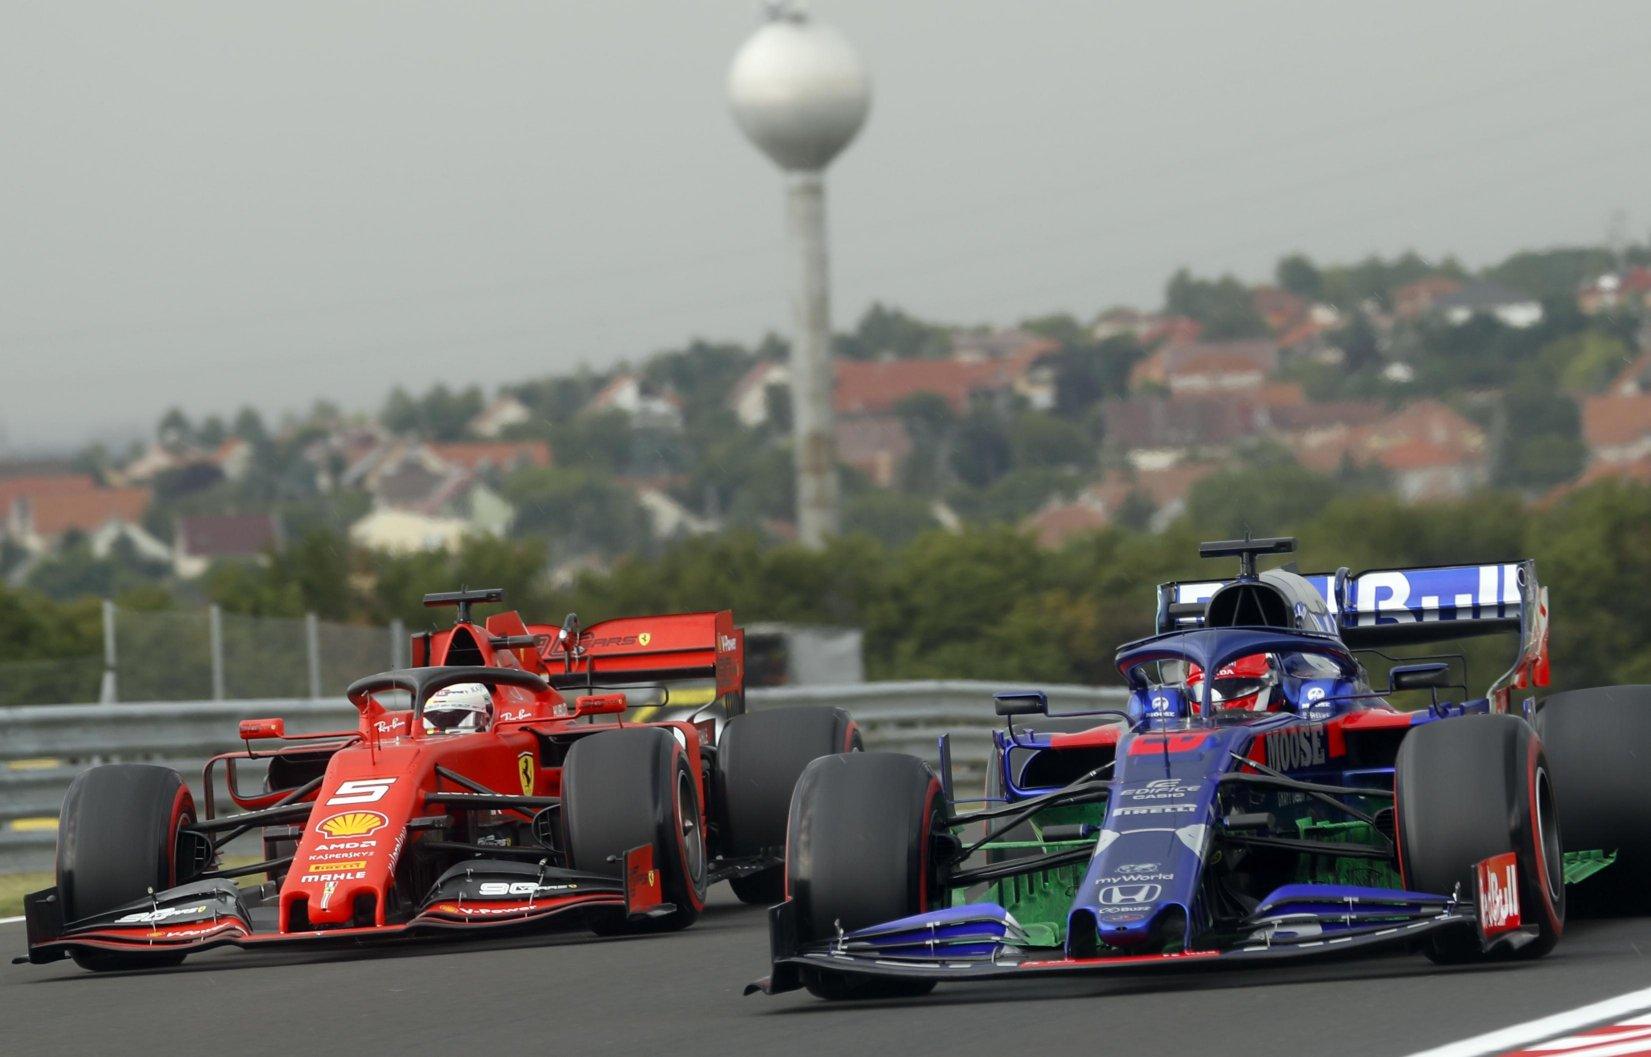 F1 Ungheria 2019, Qualifiche - Diretta Esclusiva Sky Sport, differita Tv8